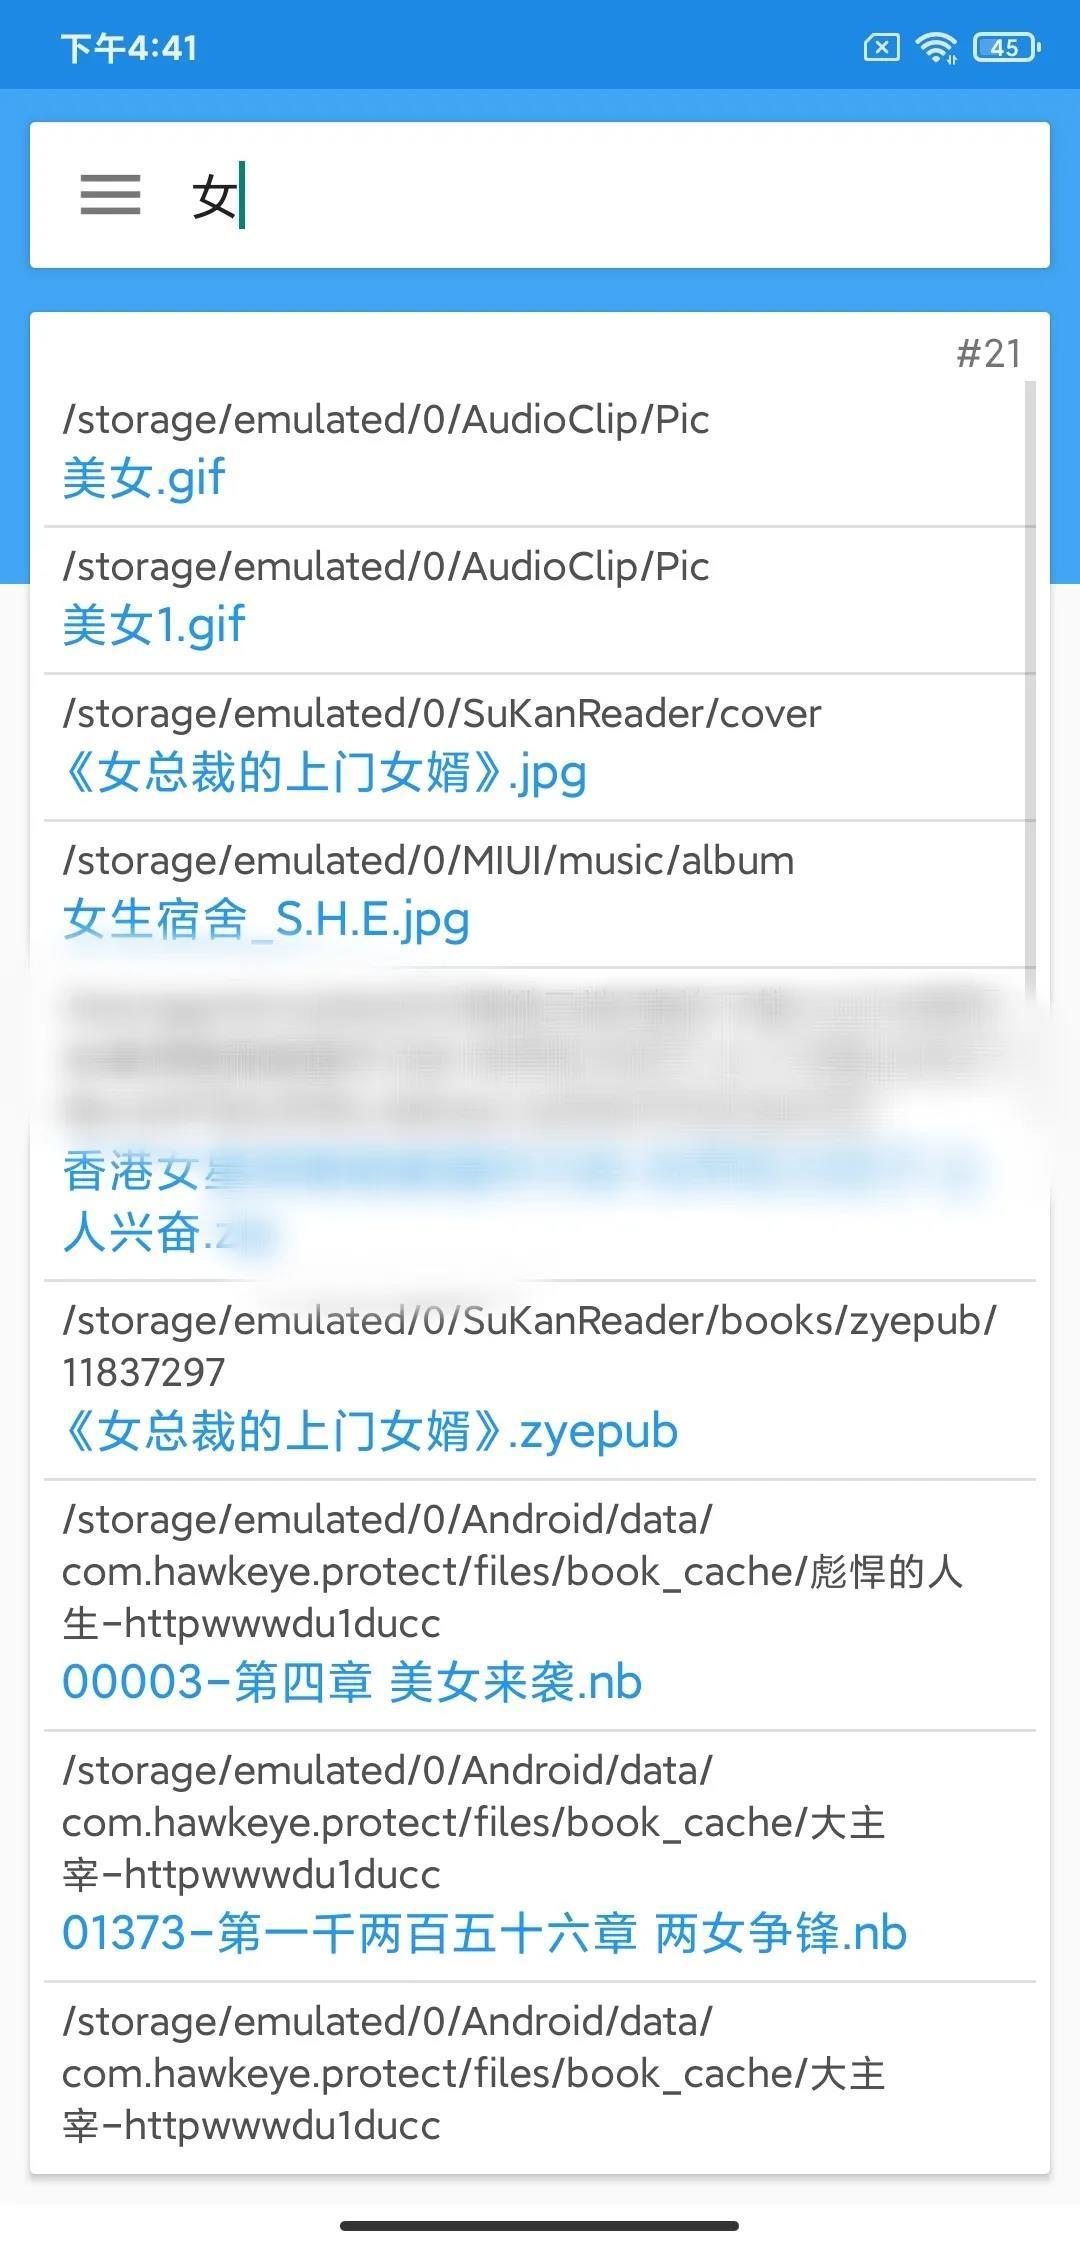 6132eda744eaada73970c6fb 非常牛逼的手机版快速搜索软件